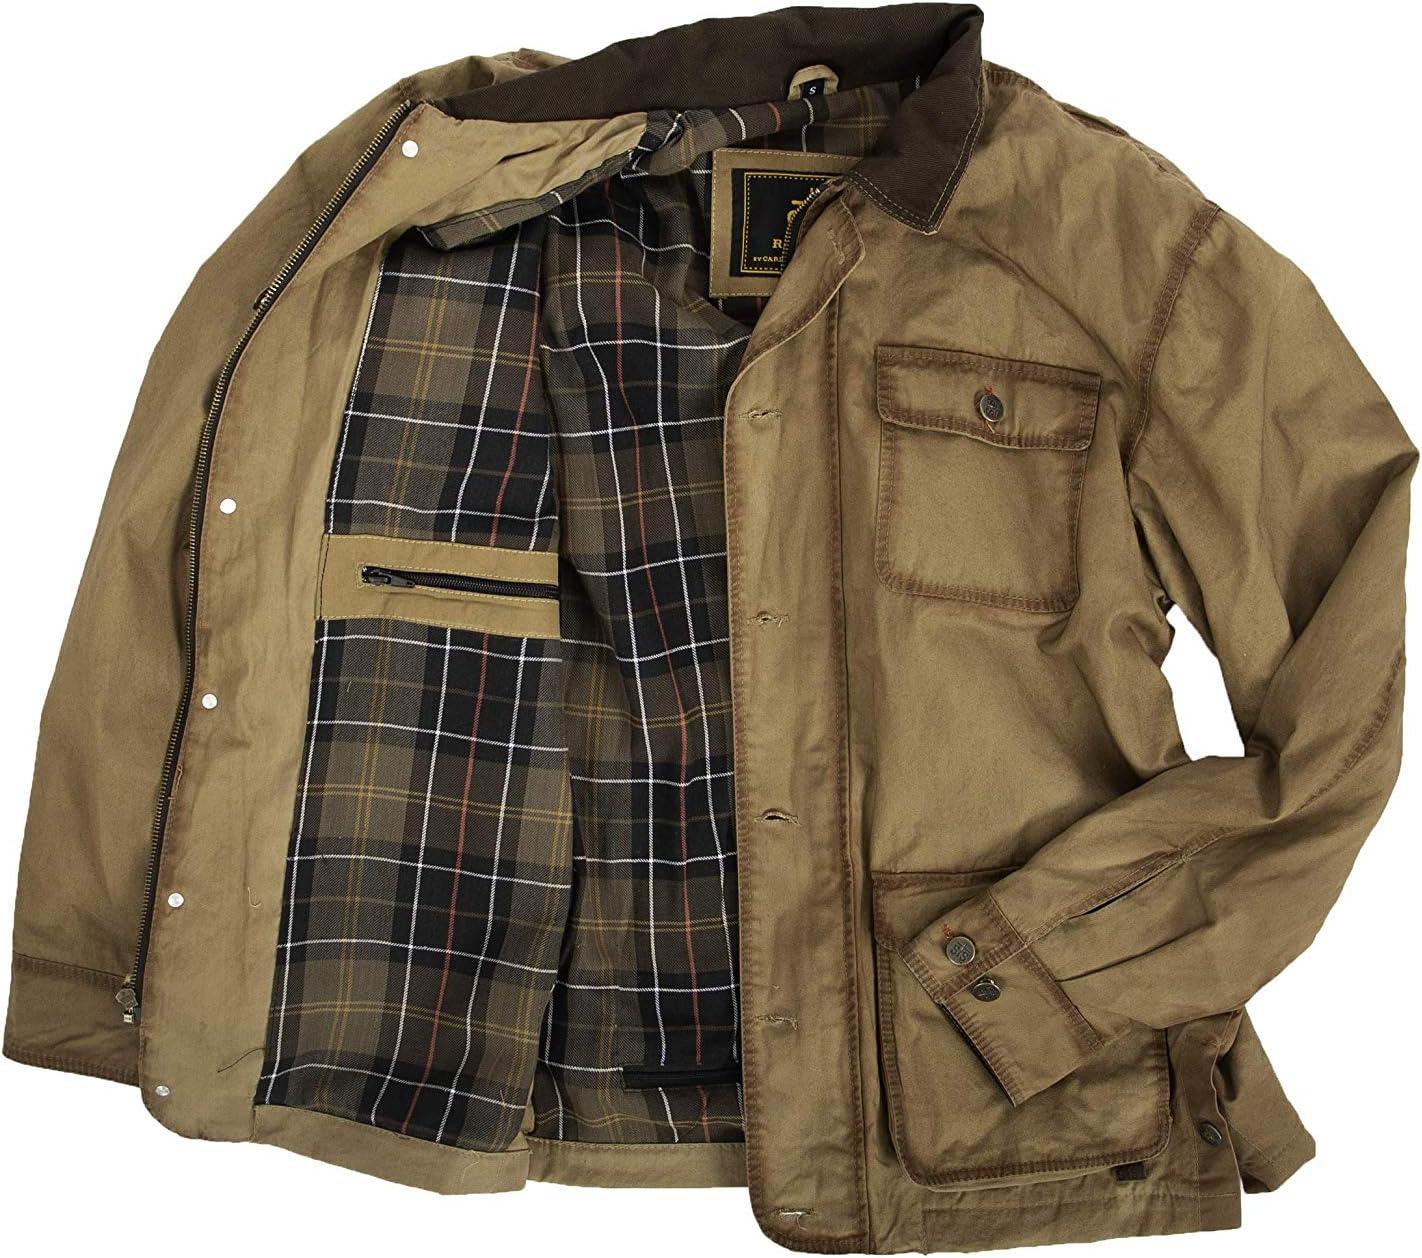 STS Ranchwear Mens Field Jacket Khaki extra large